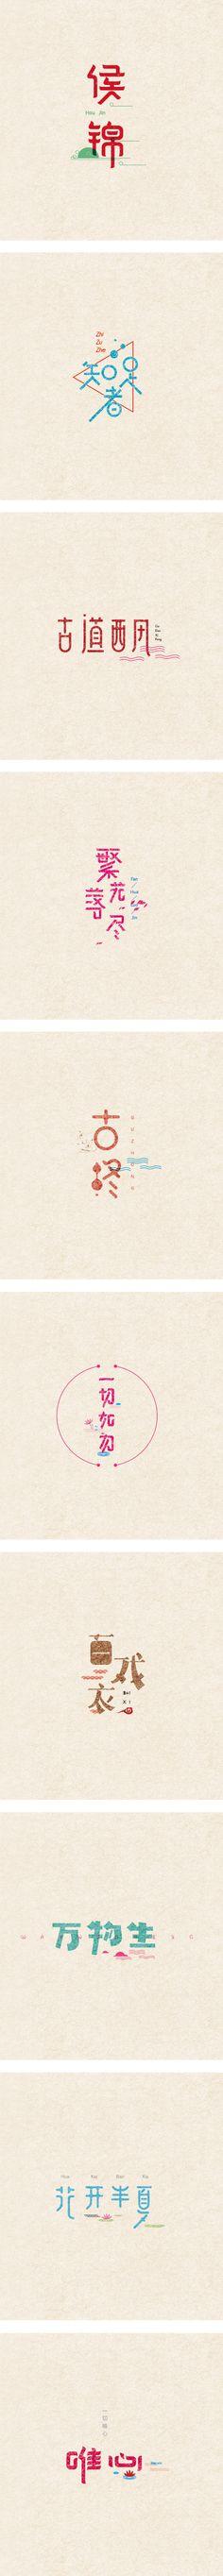 Profolio Design, Word Design, Text Design, Creative Design, Chinese Typography, Typography Letters, Typography Logo, Typography Design, Logos